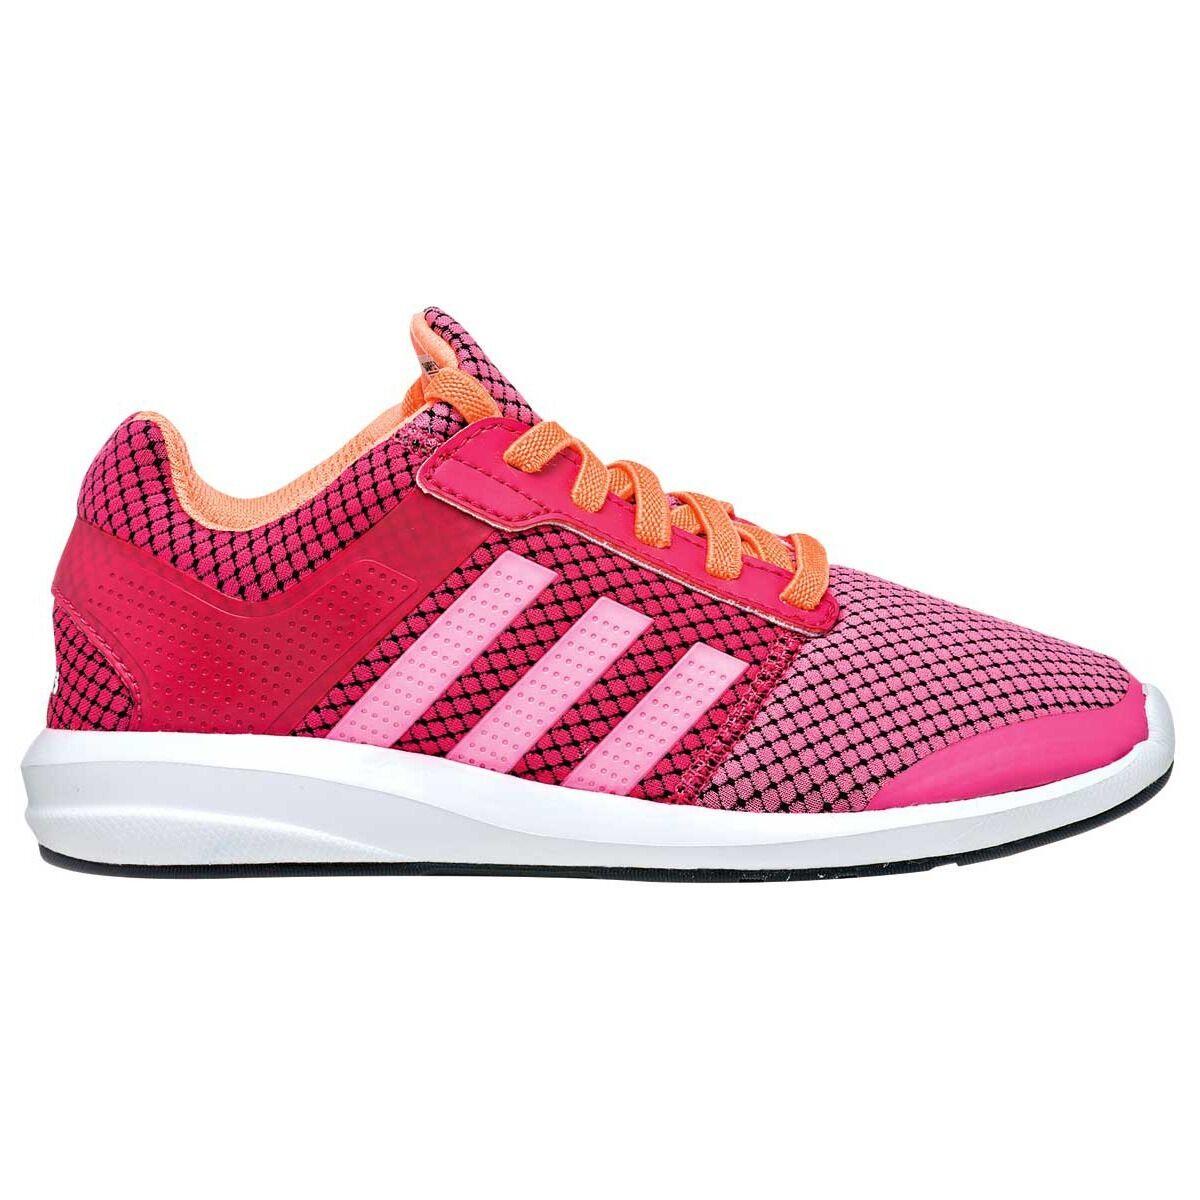 BN Adidas Hombre Ortholite C Flex zapatillas zapatillas zapatillas comodas marca de descuento 1cfcfe